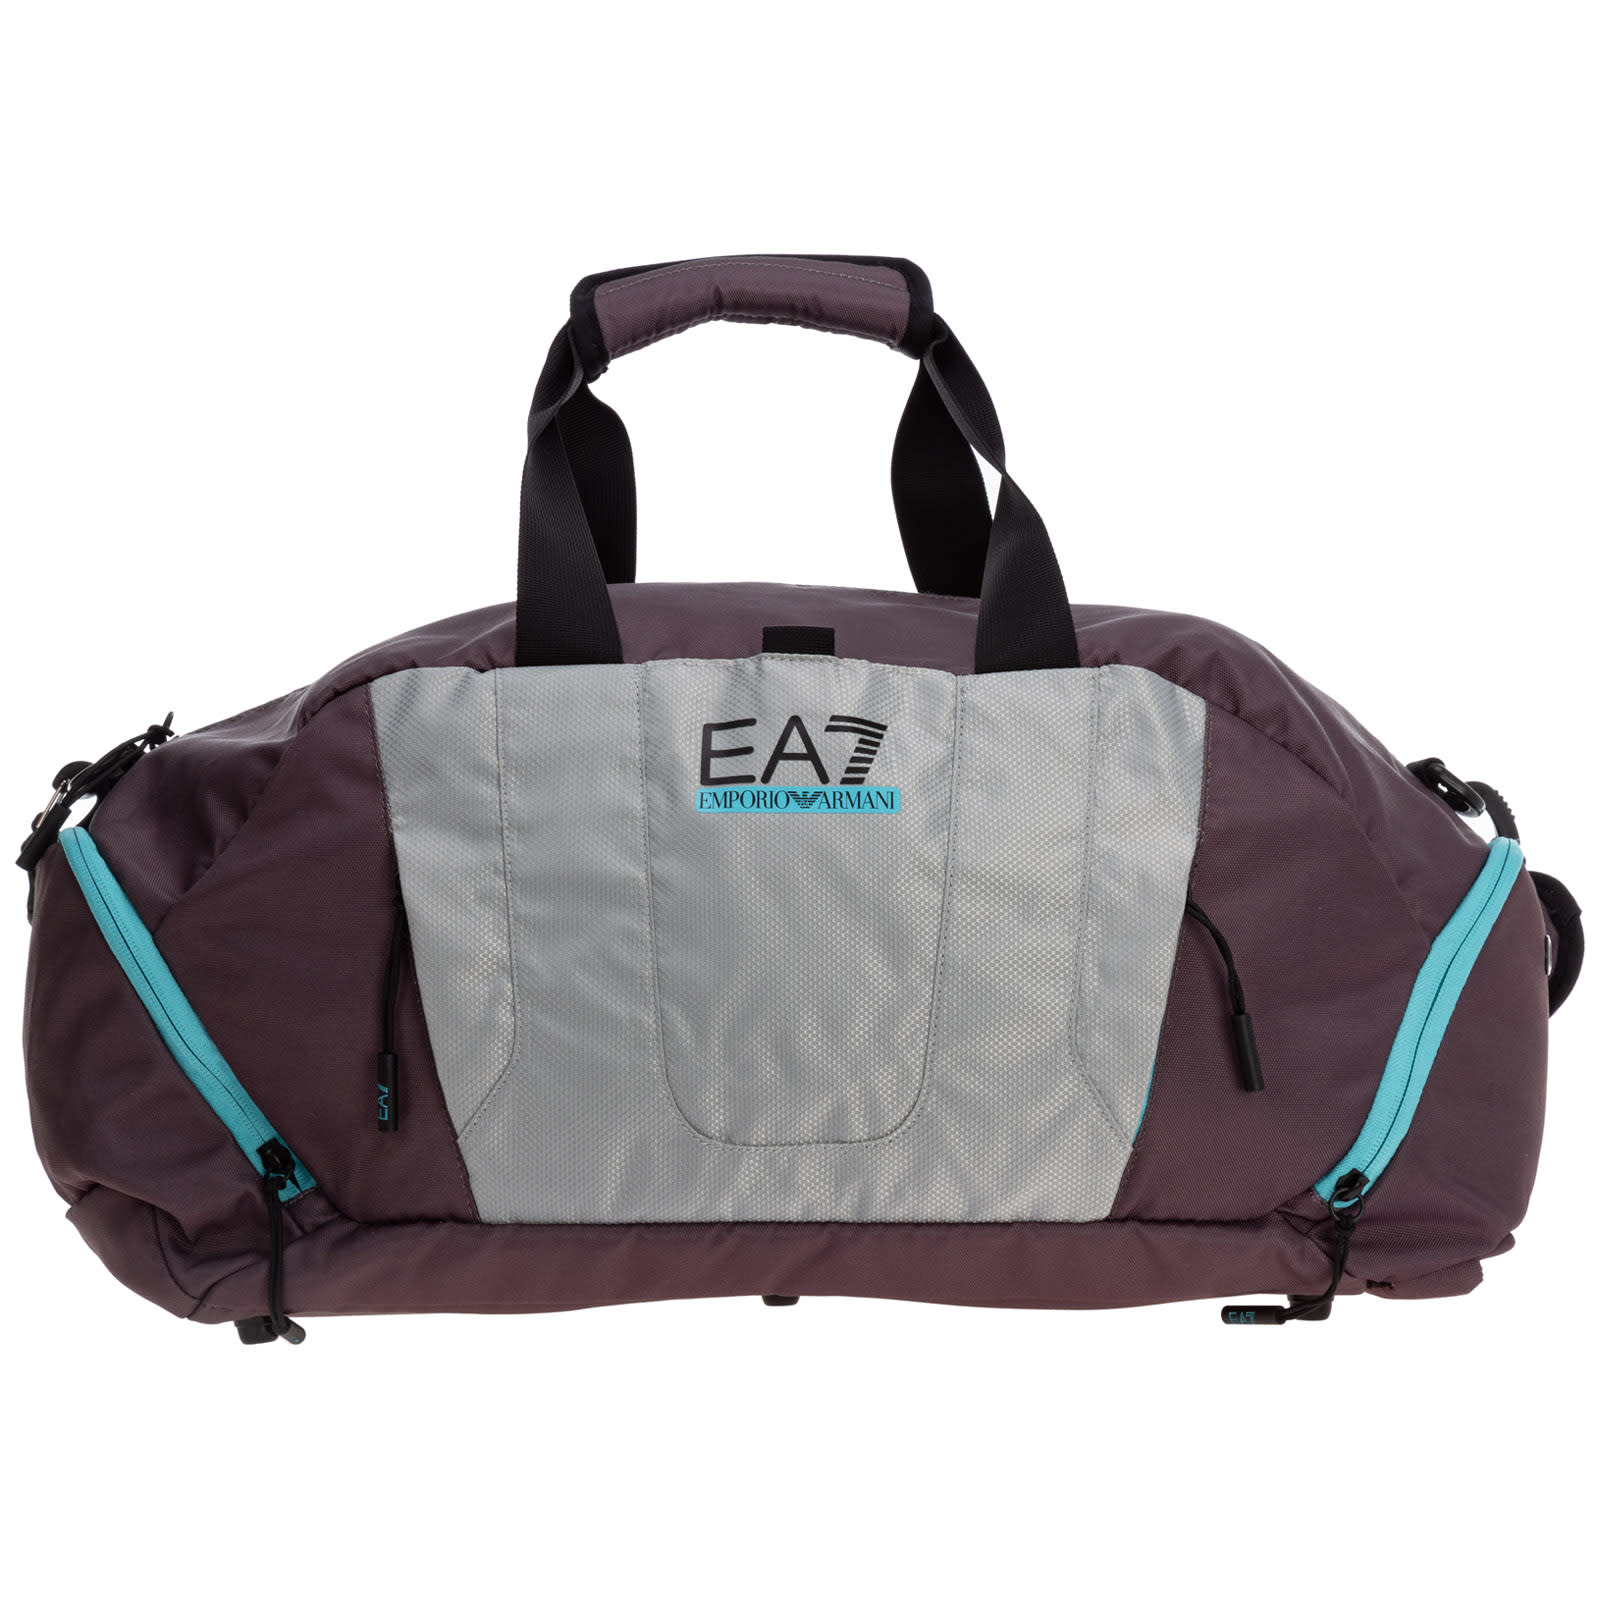 Patchouli Nosy Be Gym Bag